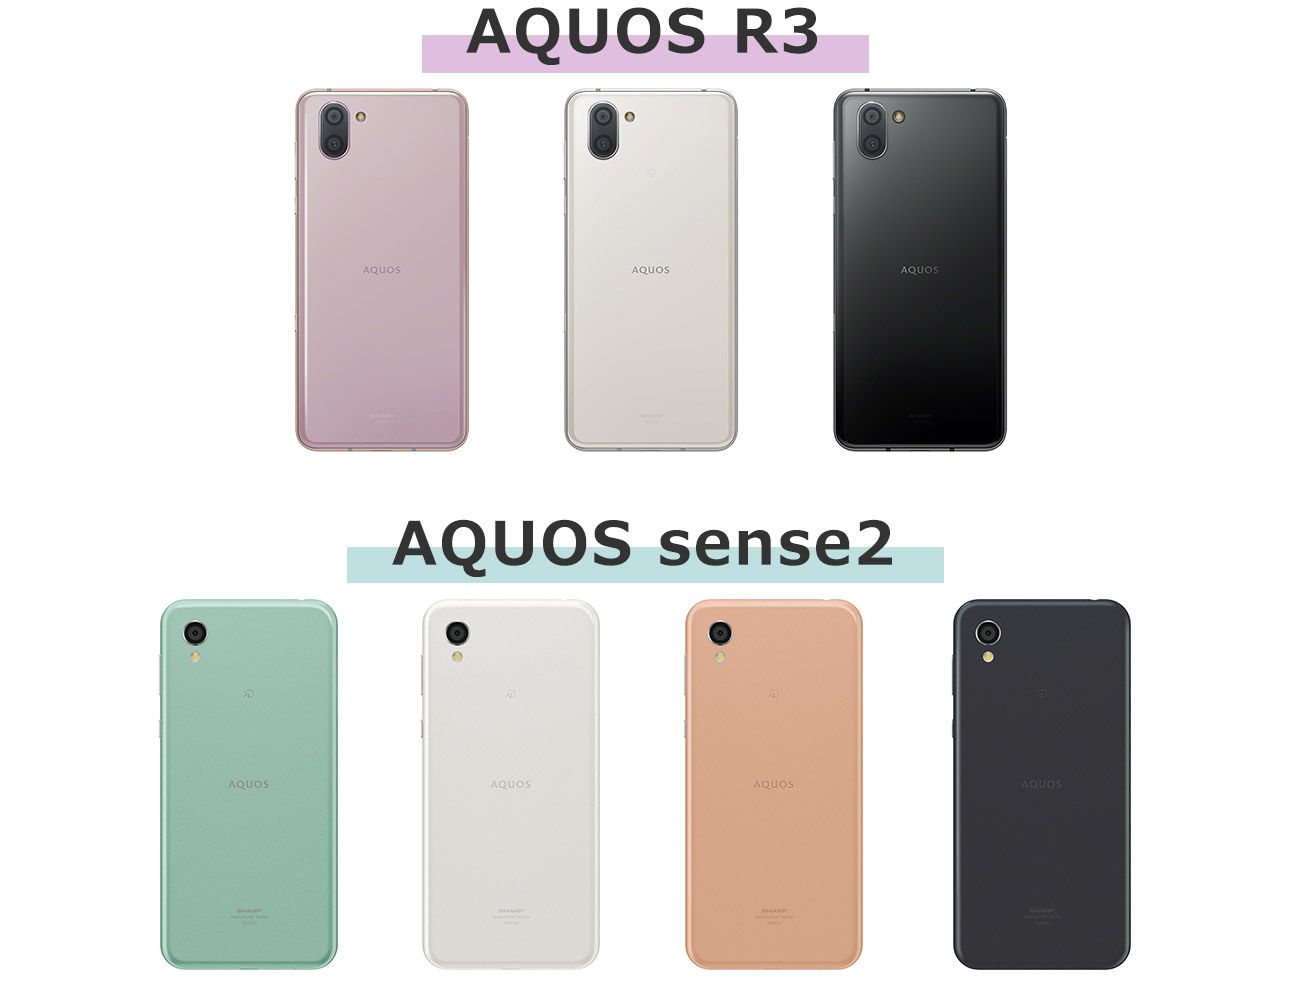 AQUOS R3とAQUOS sense2のカラーバリエーション